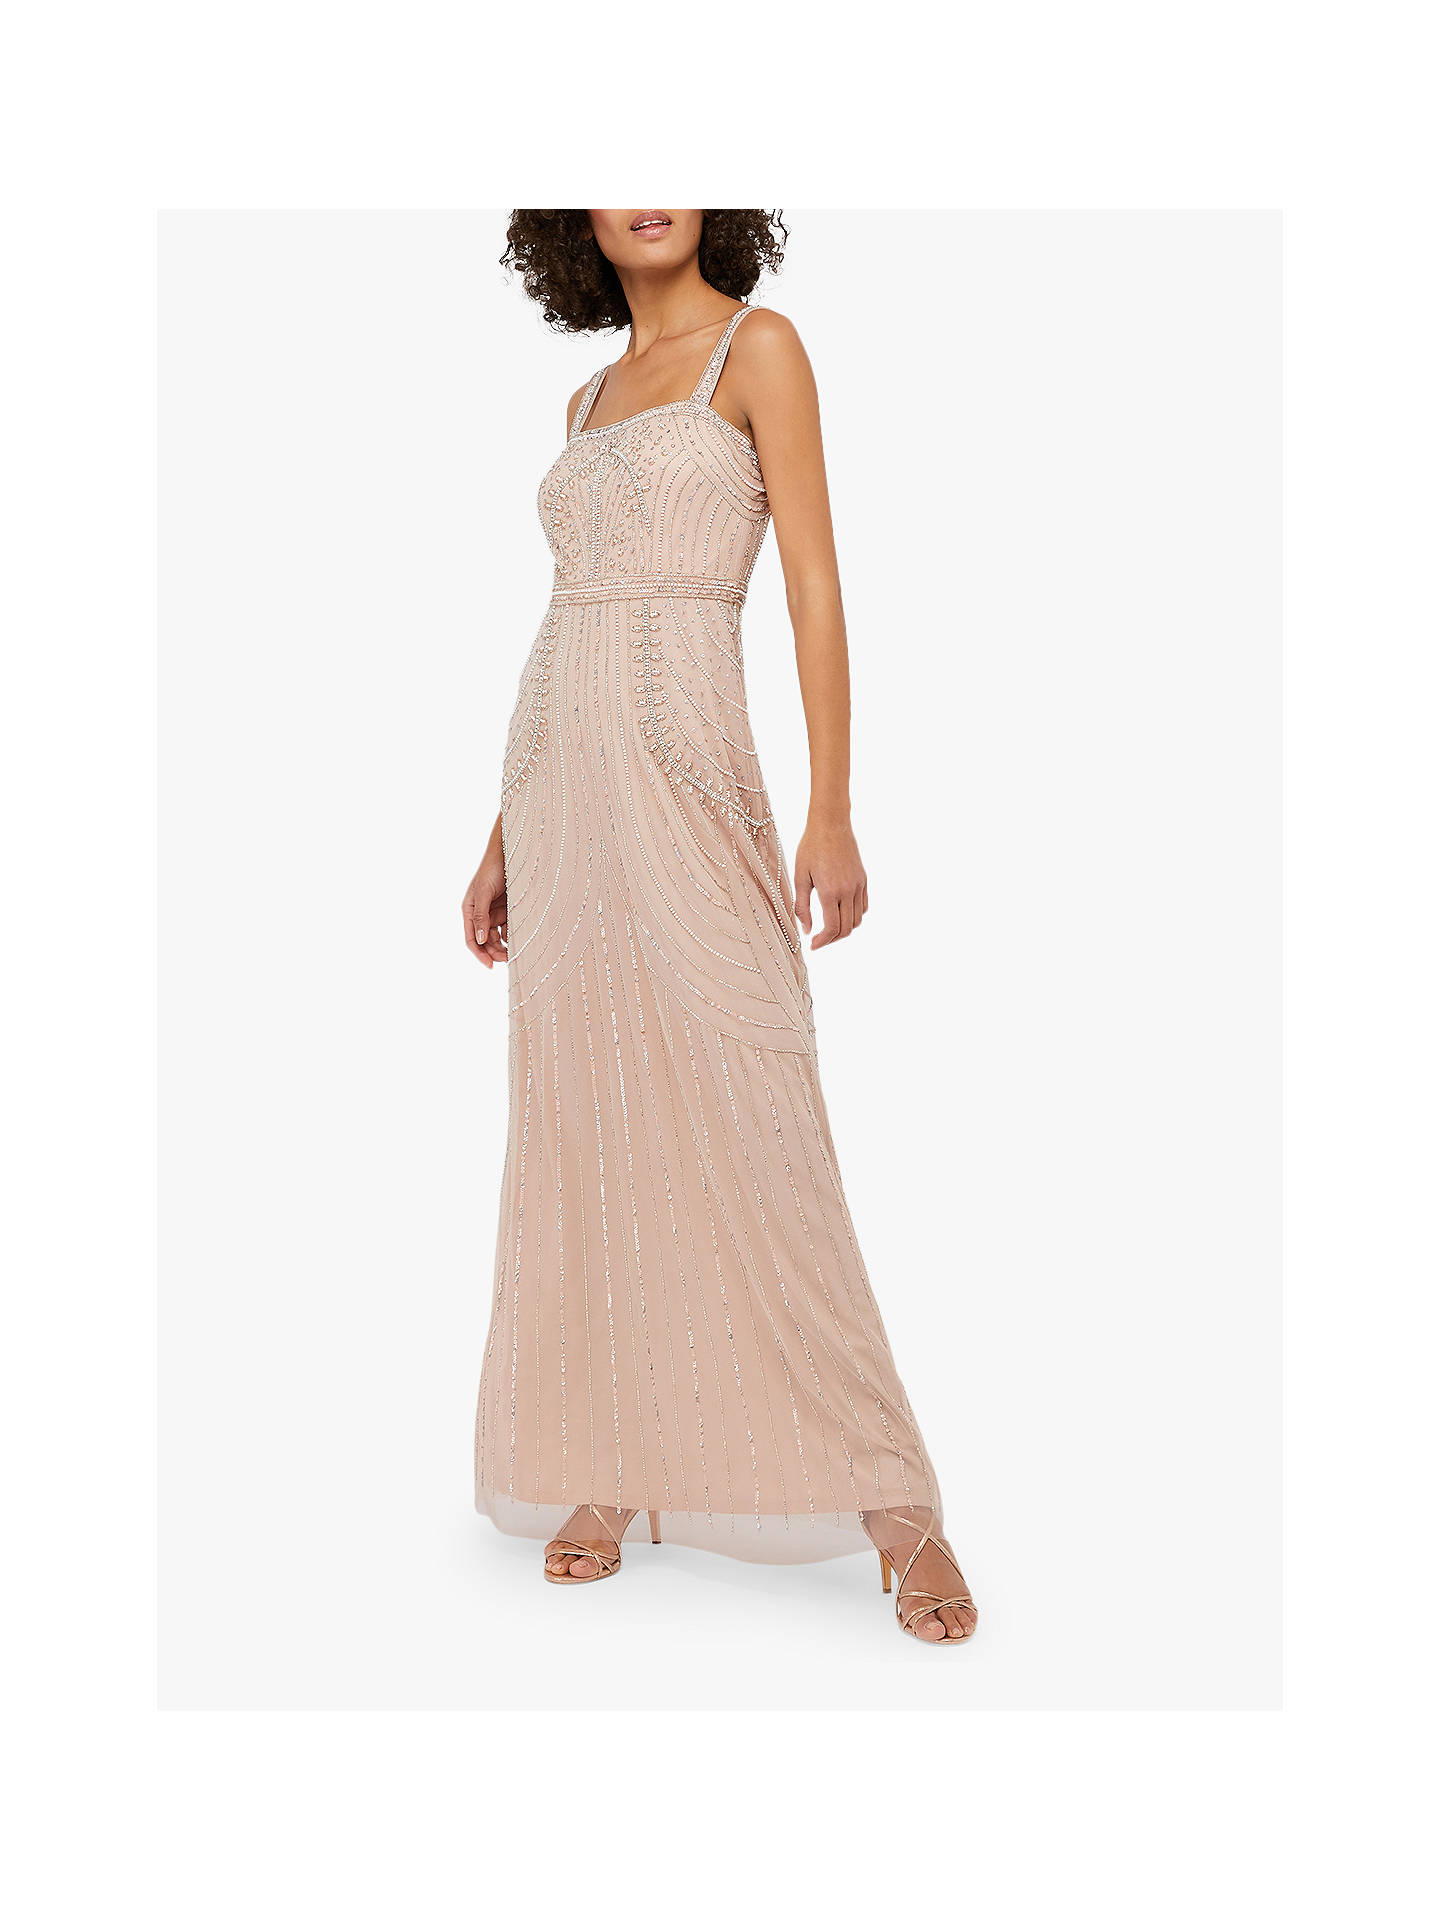 396129b809 Monsoon Lori Linear Embellished Maxi Dress, Blush